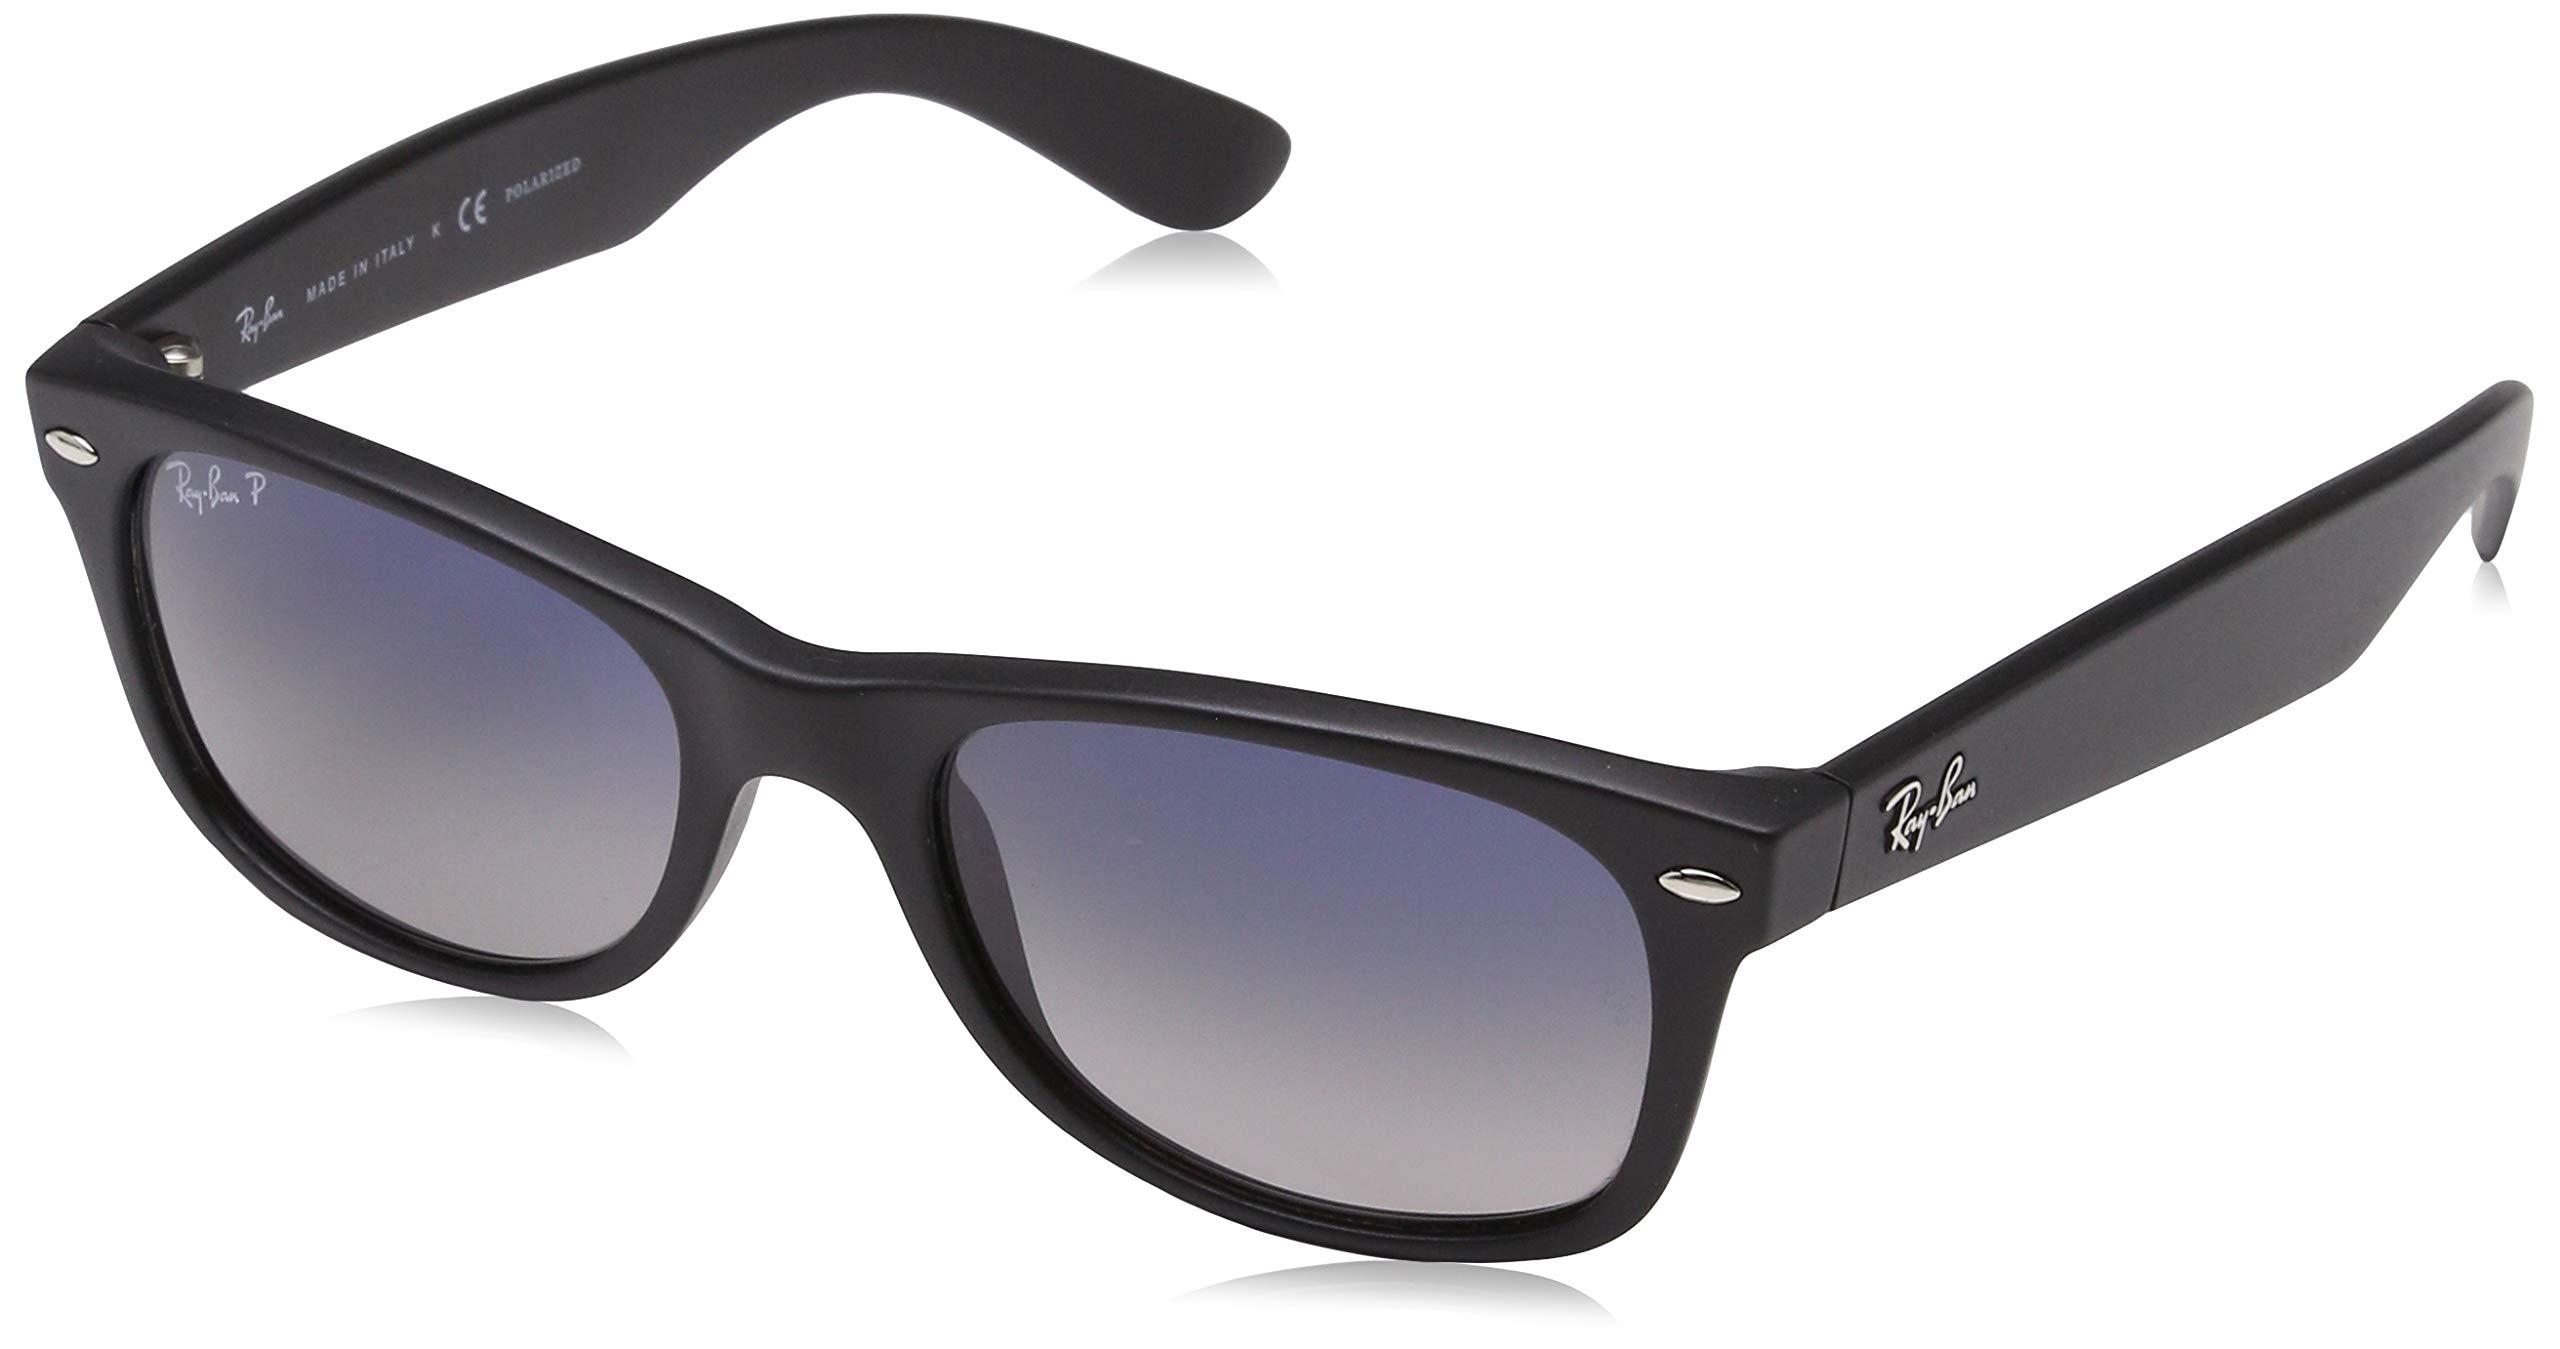 Ray-Ban Unisex New Wayfarer Polarized Sunglasses, Black/Polarized Blue/Grey Gradient, Blue Gradient Grey, 55mm by Ray-Ban (Image #1)